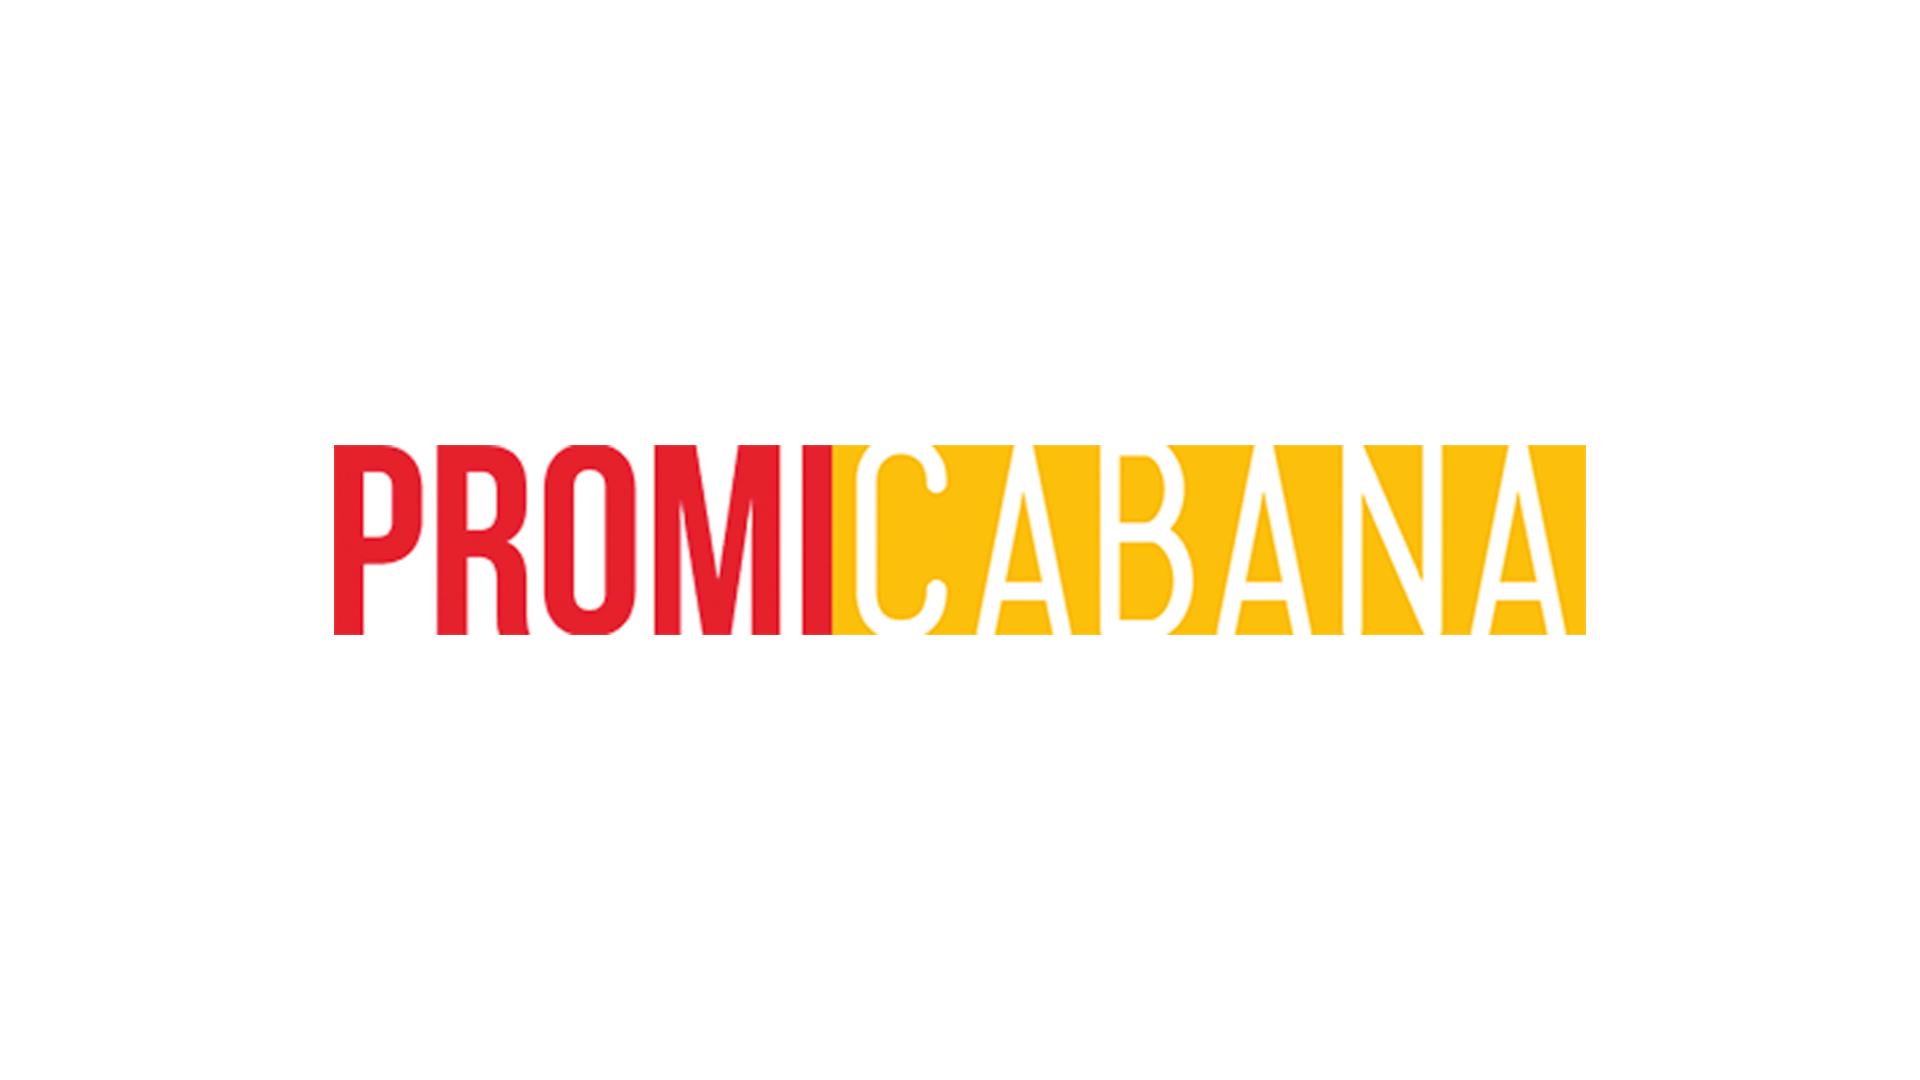 Liam-Hemsworth-Woody-Harrelson-Extra